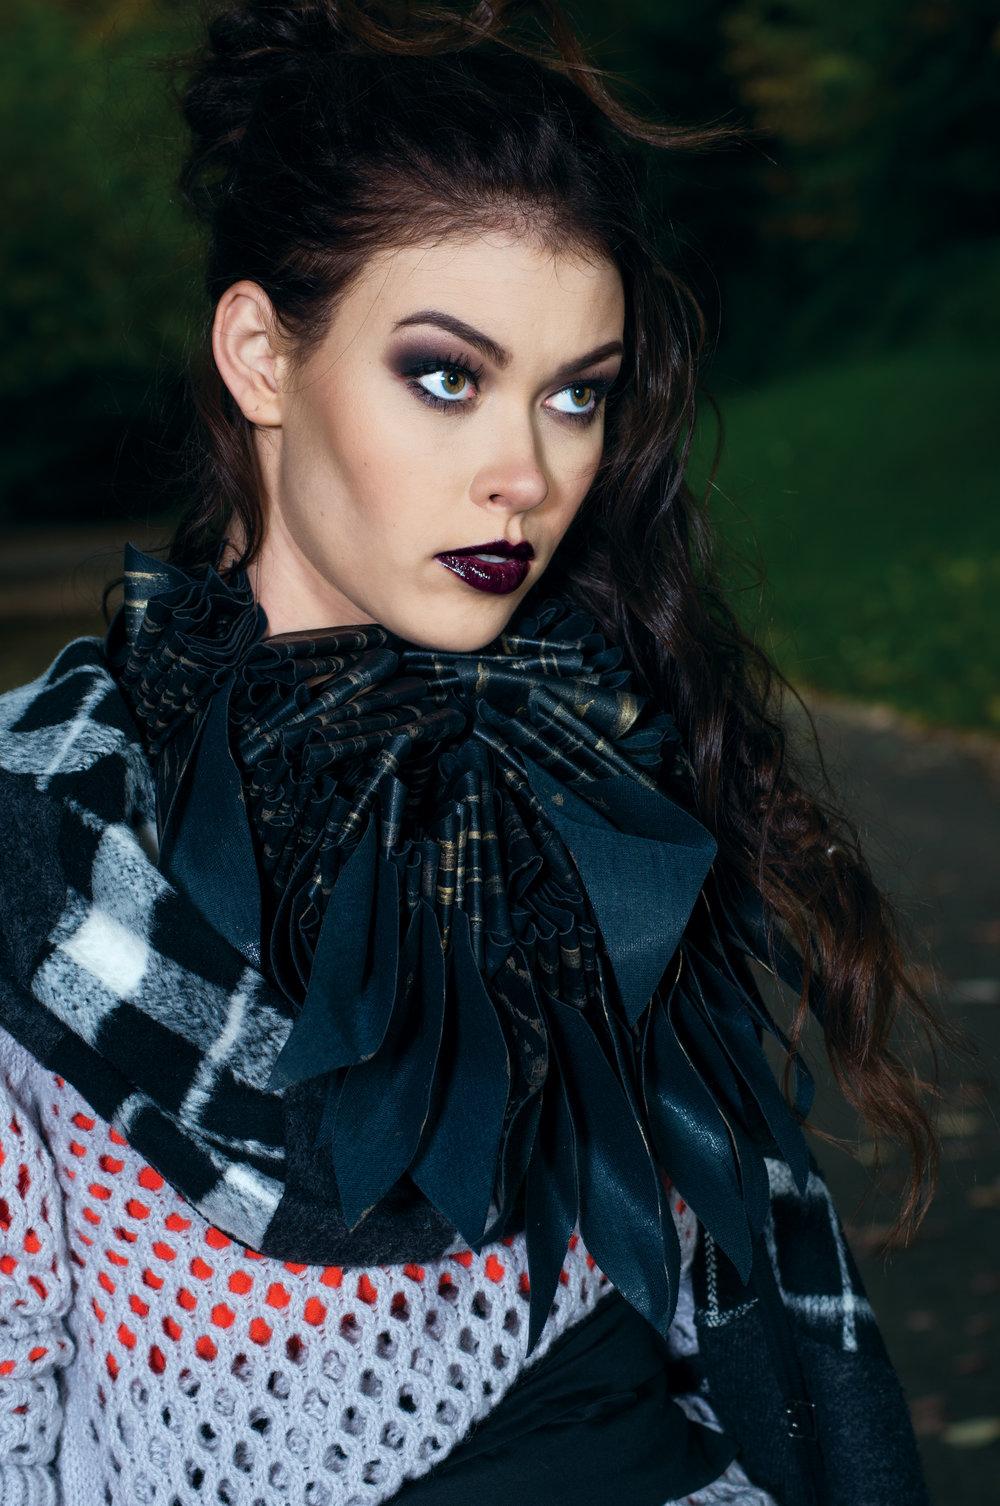 zaramia-ava-zaramiaava-leeds-fashion-designer-ethical-sustainable-tailored-minimalist-jacket-accent-coat-jacket-print-shirt-top-versatile-drape-cowl-styling-shop-womenswear-models-photoshoot-colour-12